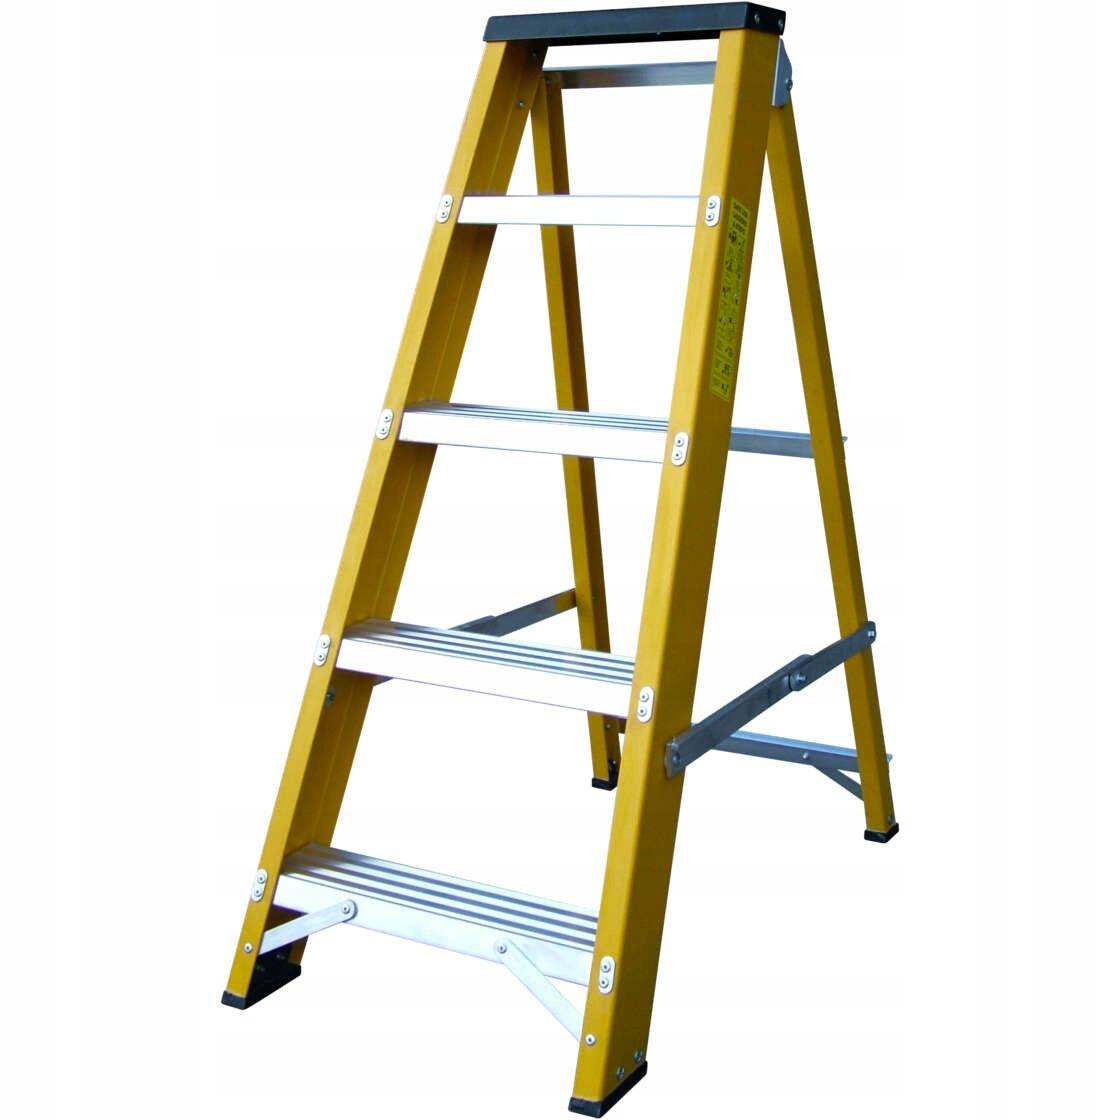 LYTE Ladder 5-й диэлектрический стекловолокно